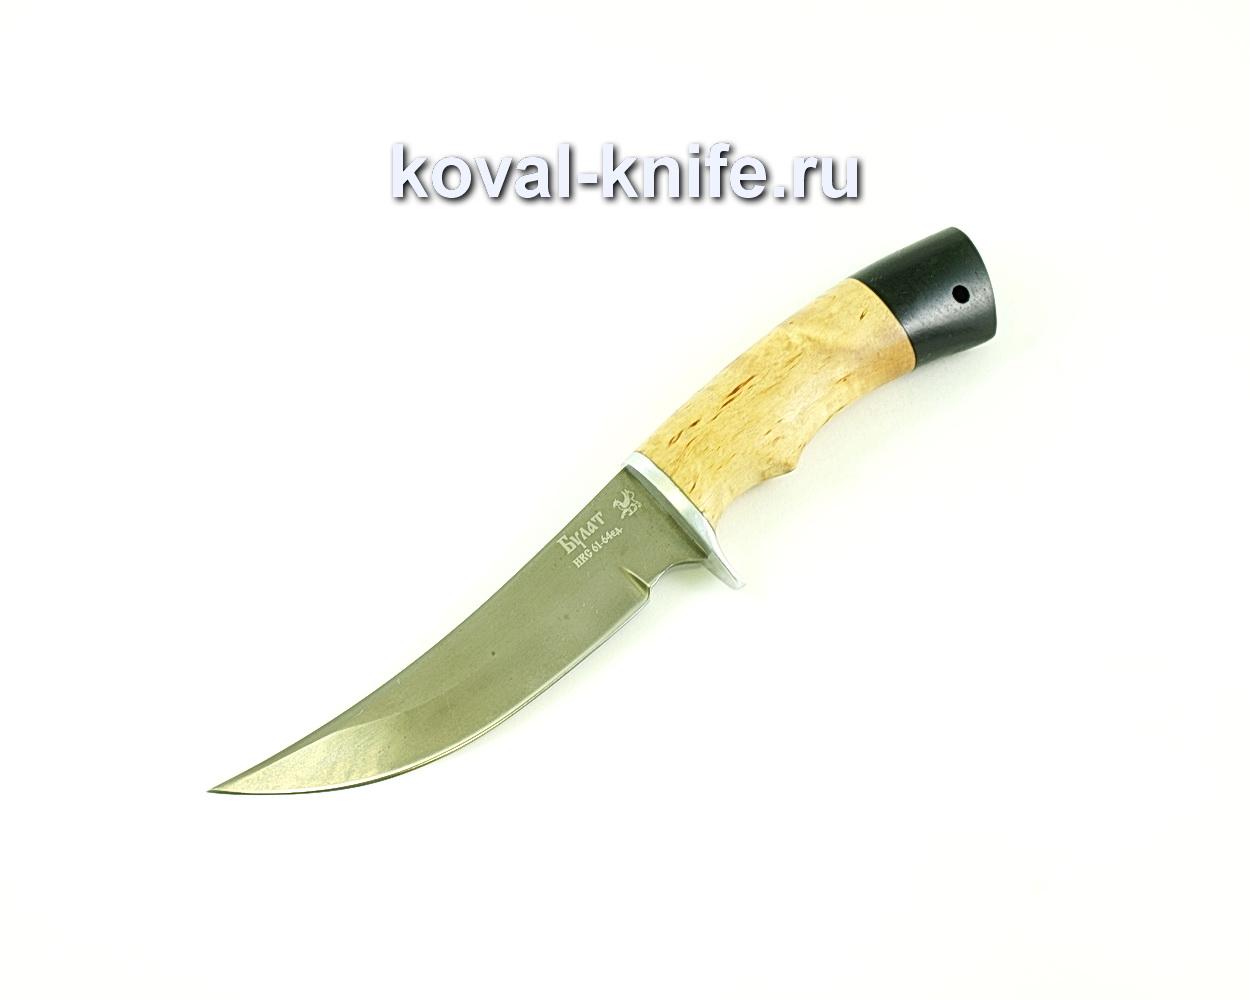 Нож Ворон (сталь Булат), рукоять карелка, граб A143